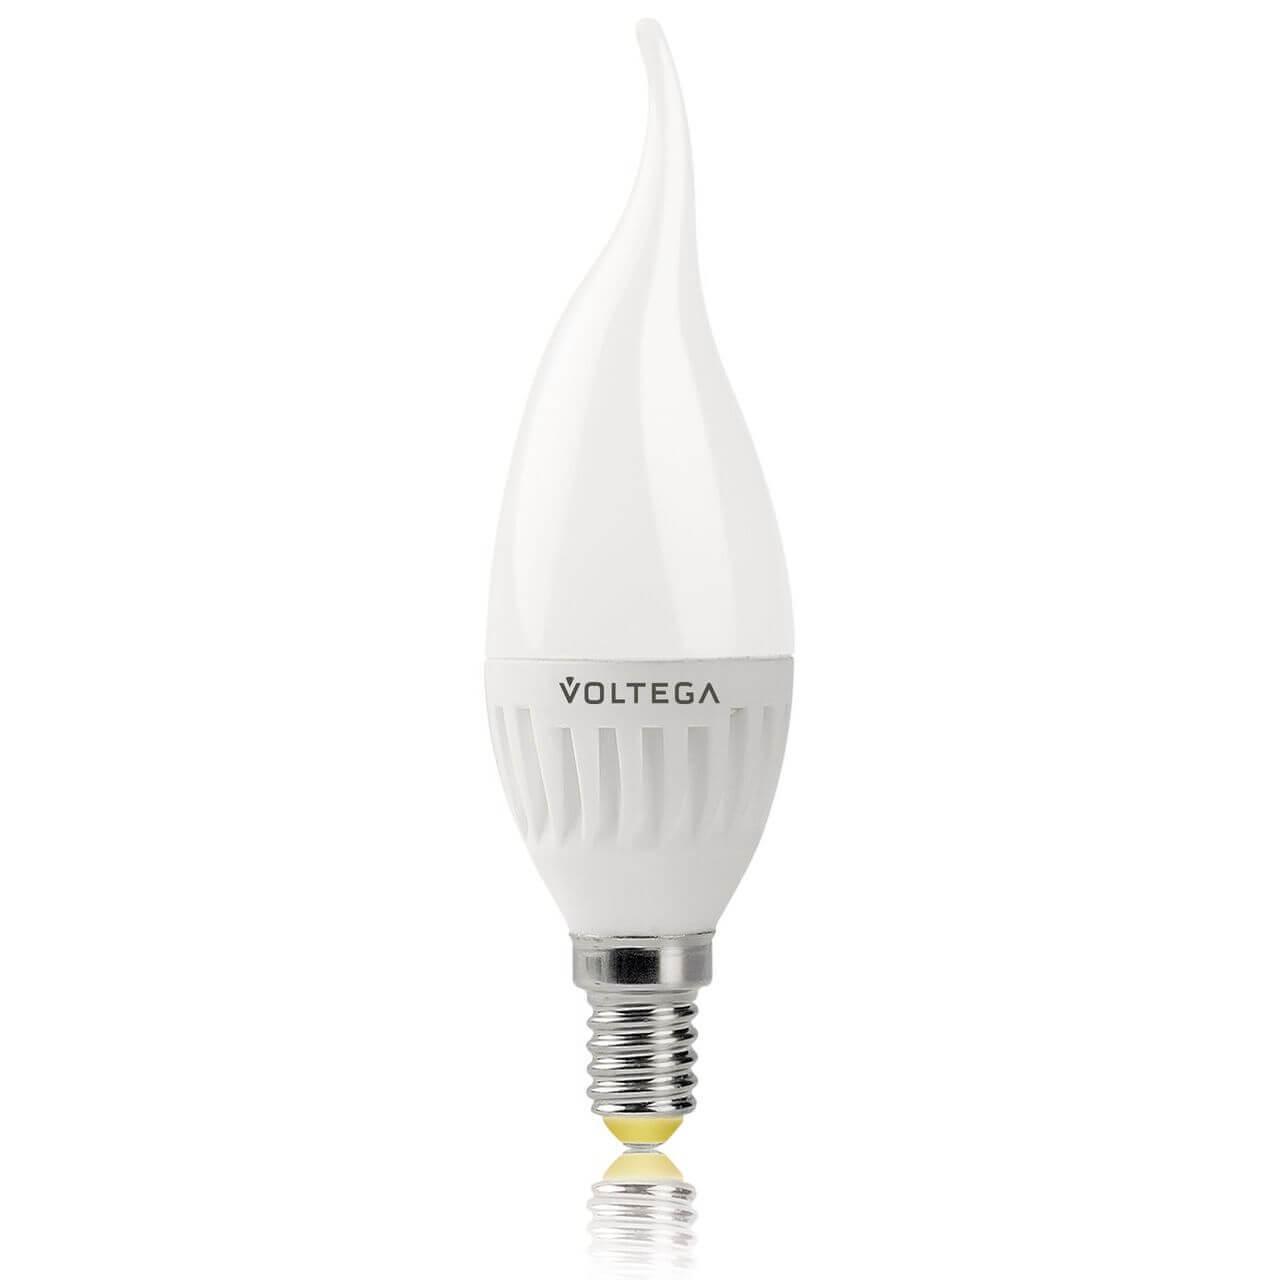 Лампа светодиодная Voltega E14 6W 2800К матовая VG1-CW2E14warm6W-C 5719 ретро лампа 5928 voltega